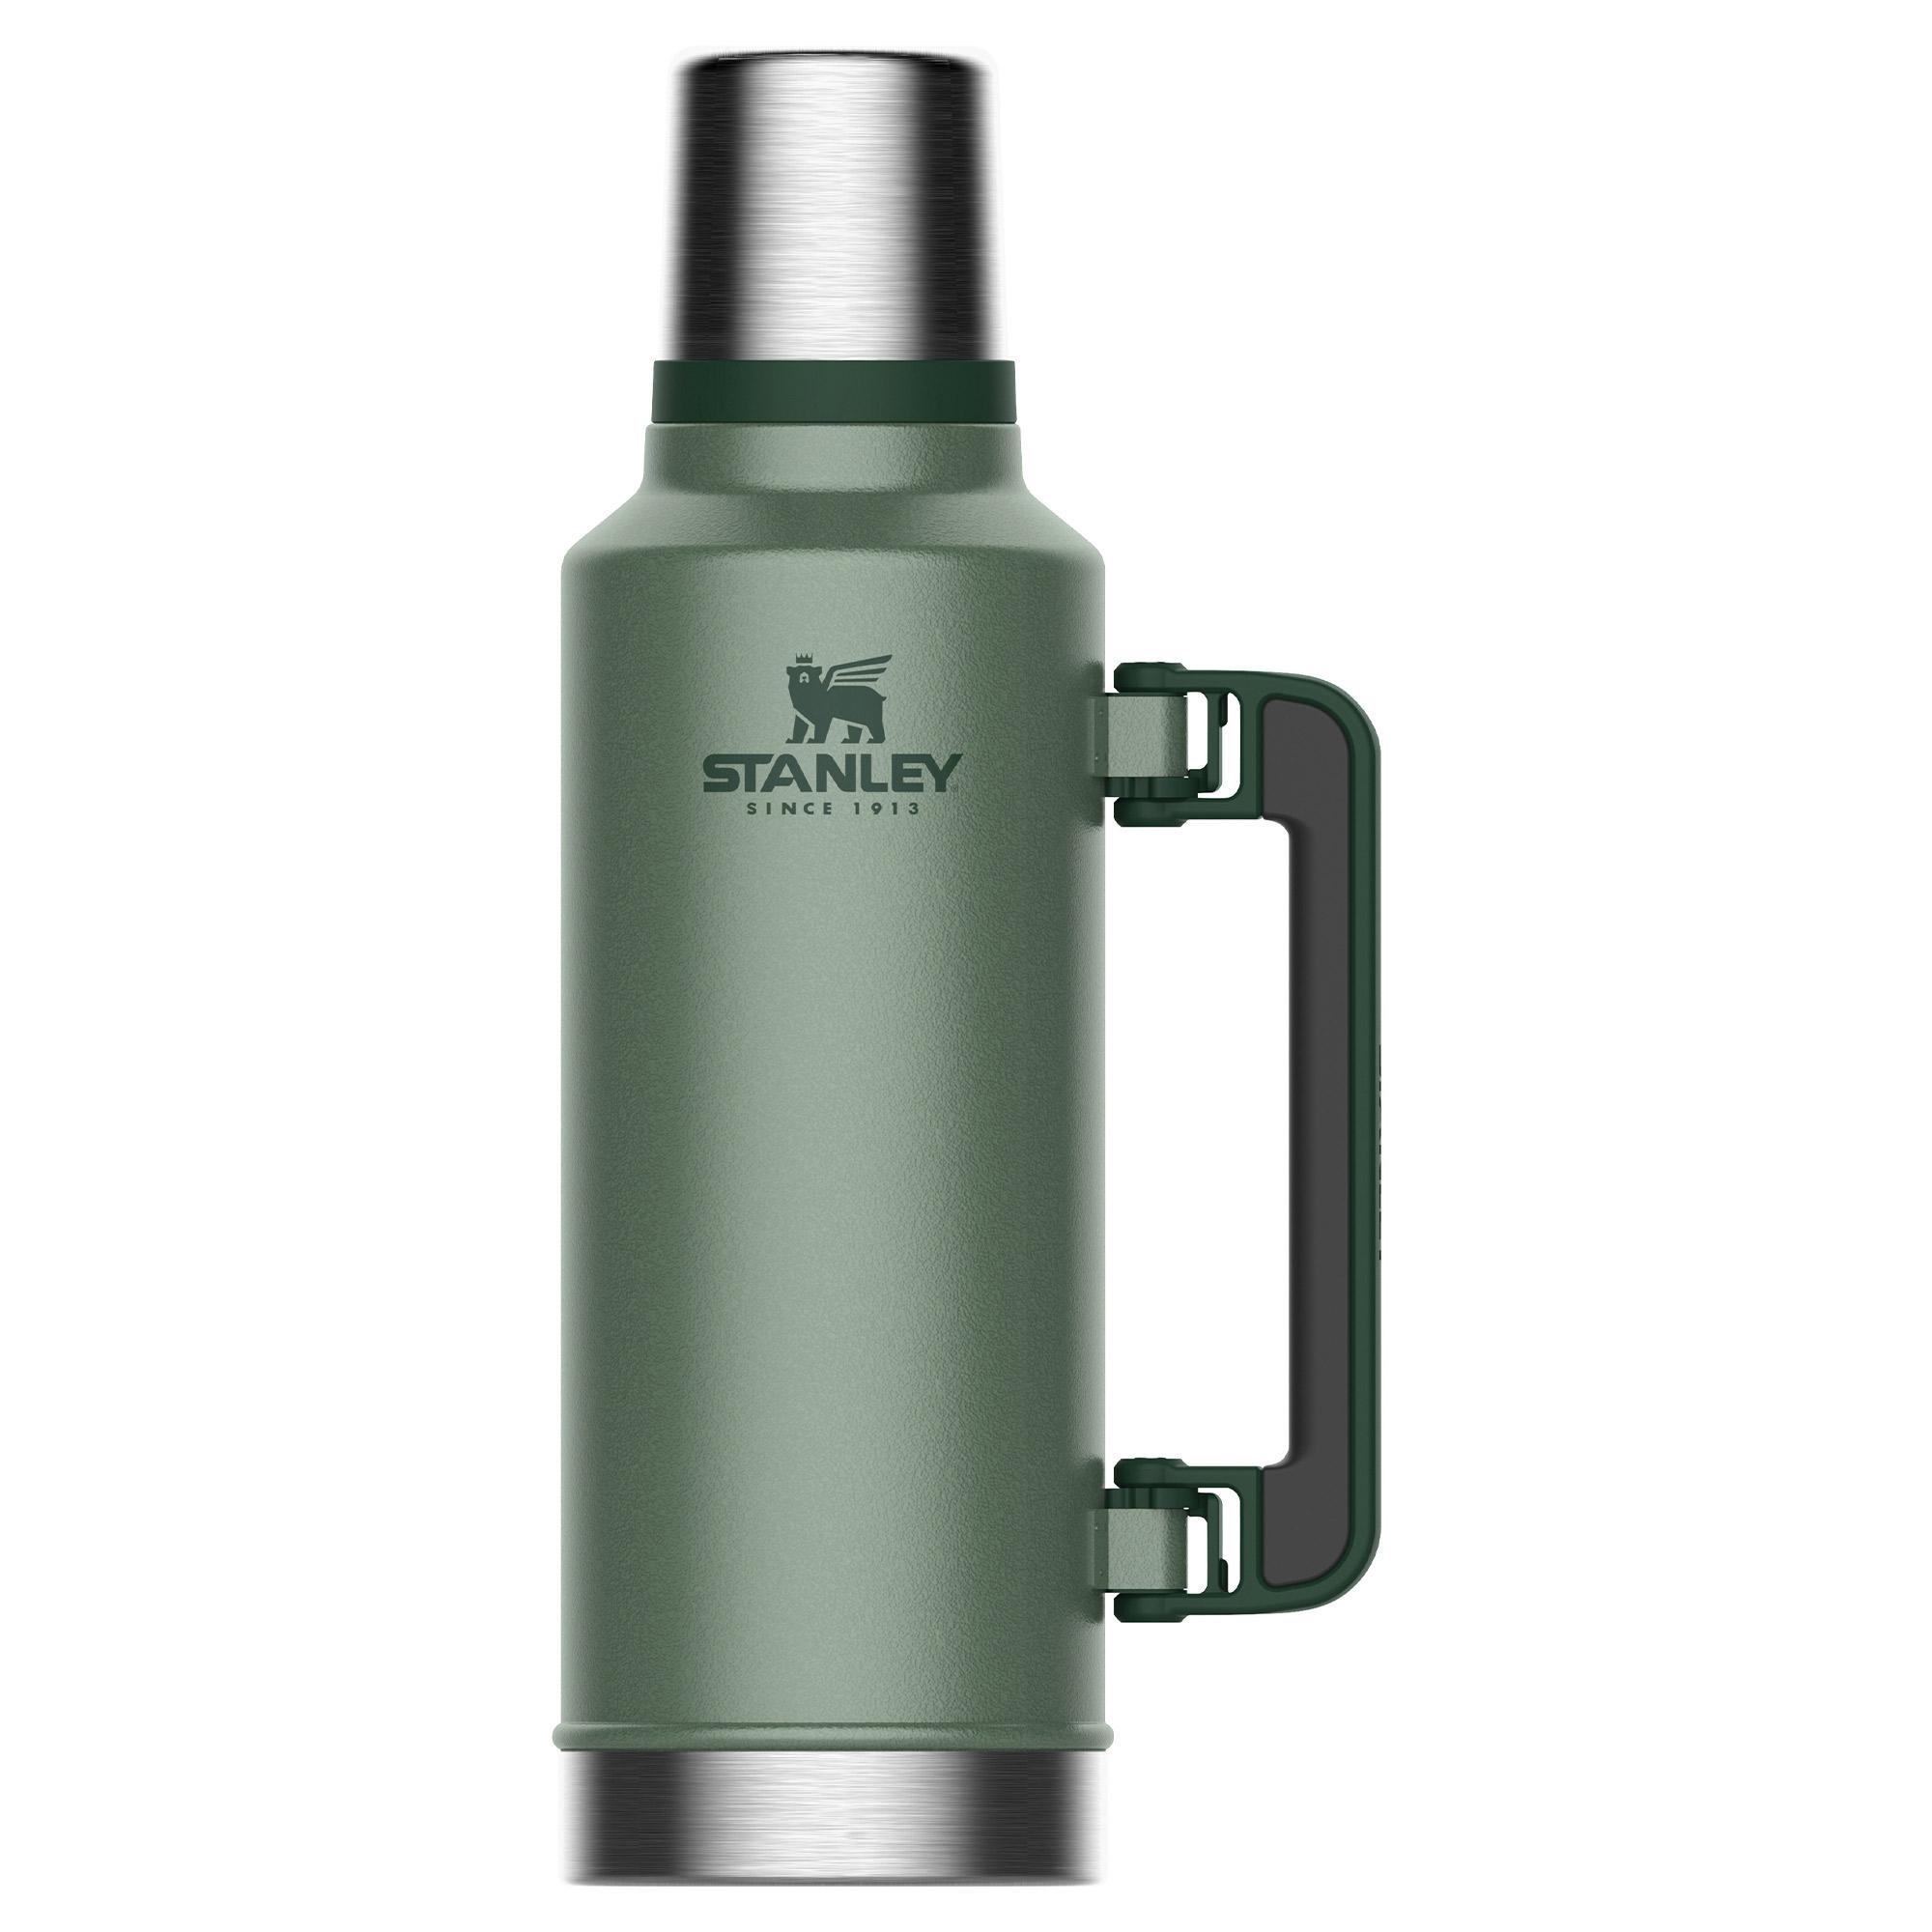 Thermoskanne Stanley 2 Liter oliv